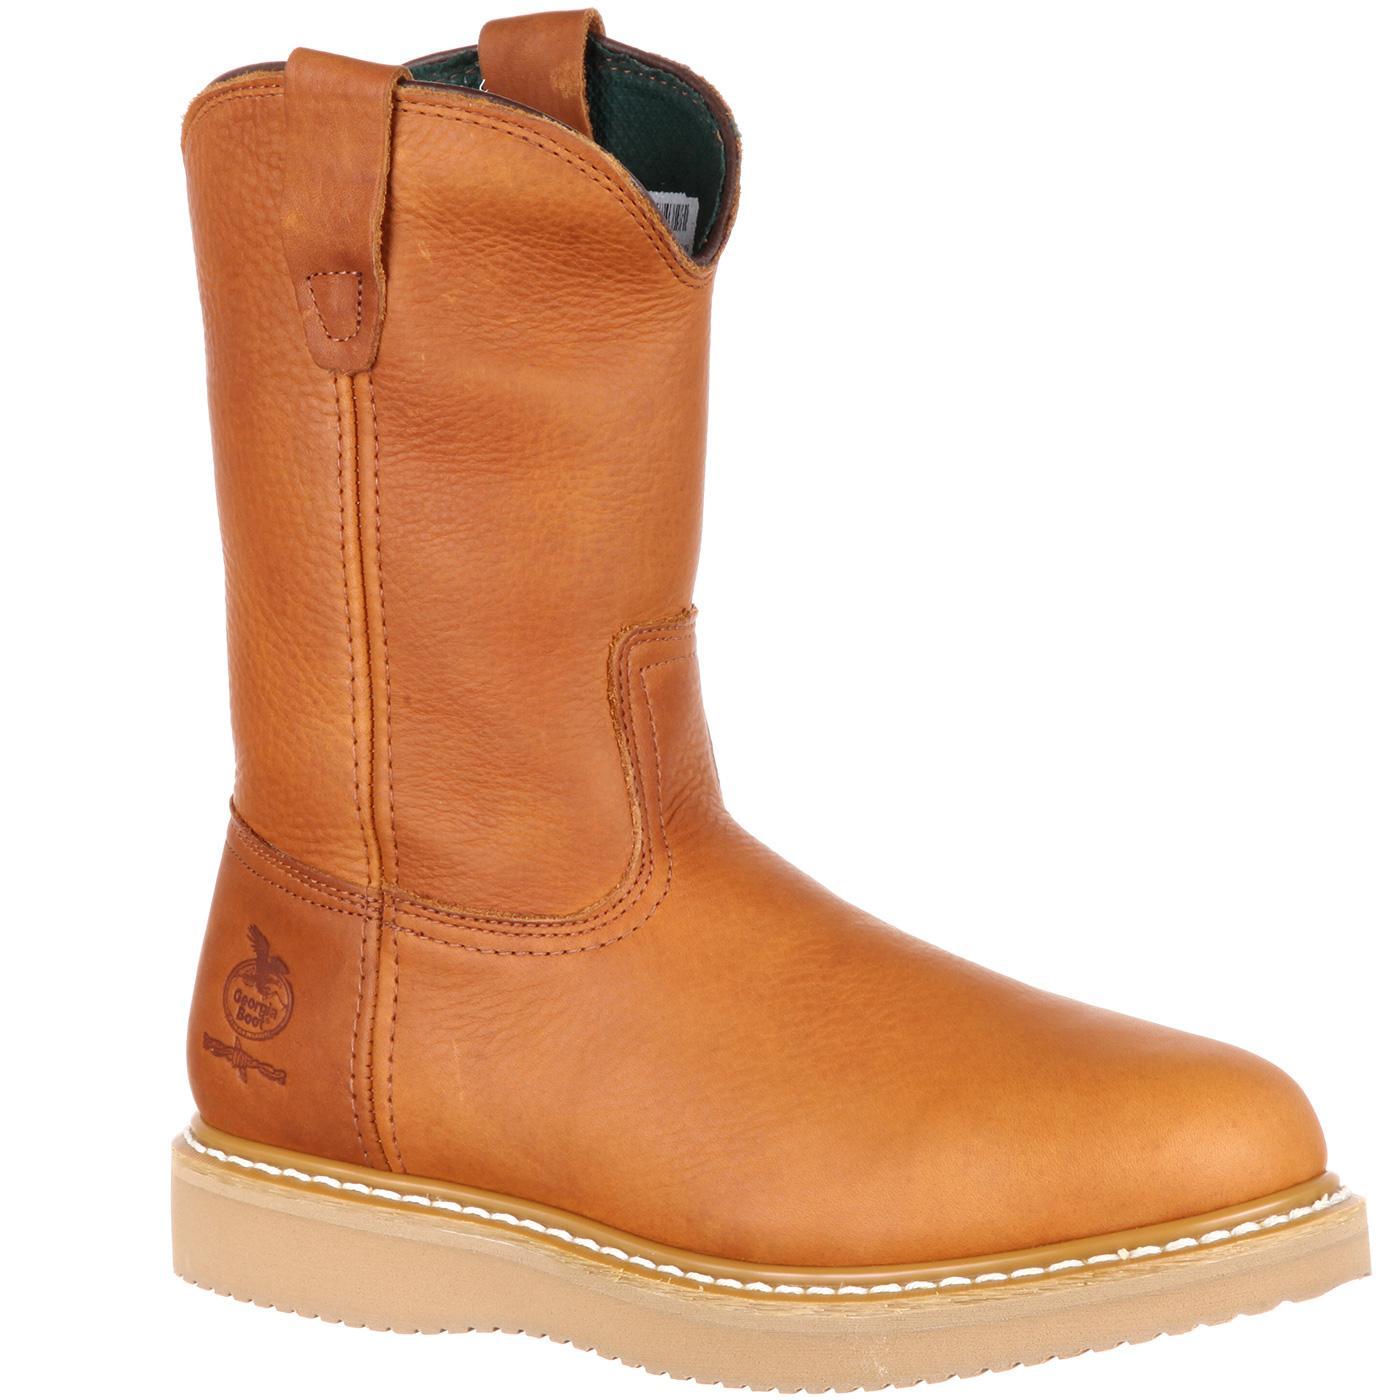 27a7af56a47 Georgia Boot Wedge Steel Toe Pull On Work Boot